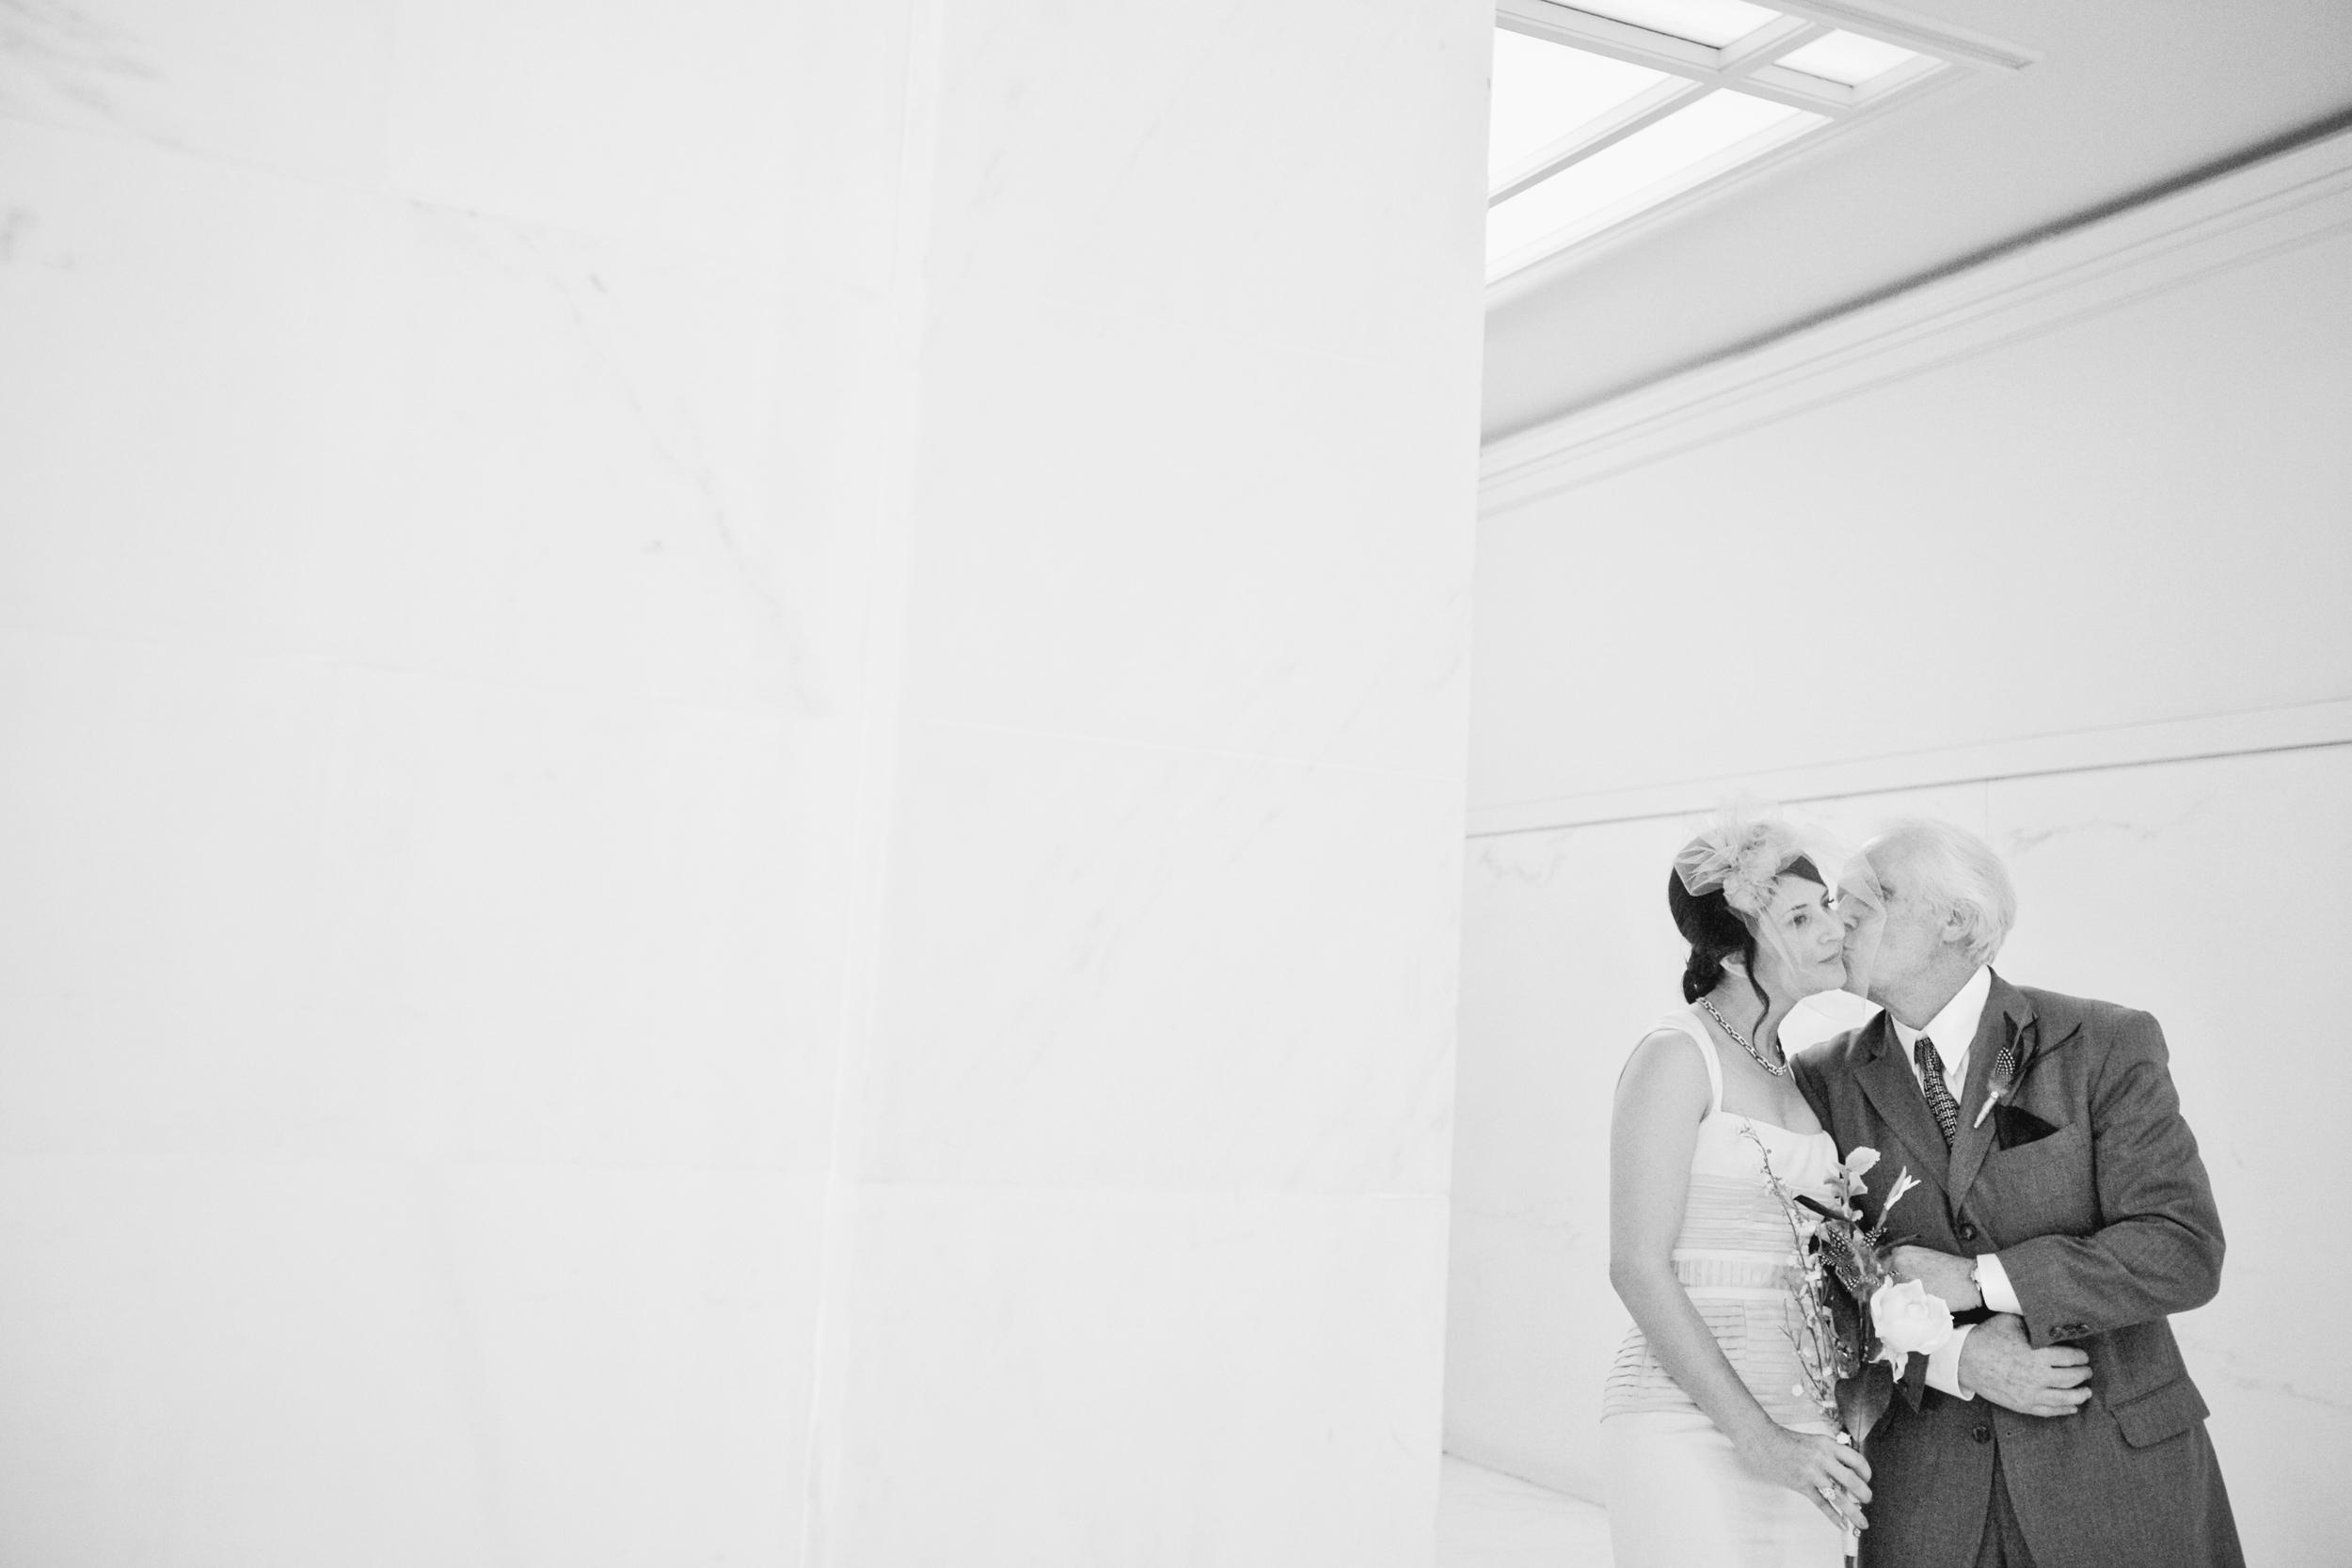 San_Francisco_City_Hall_Wedding_Photography_Cori_EB-05.JPG